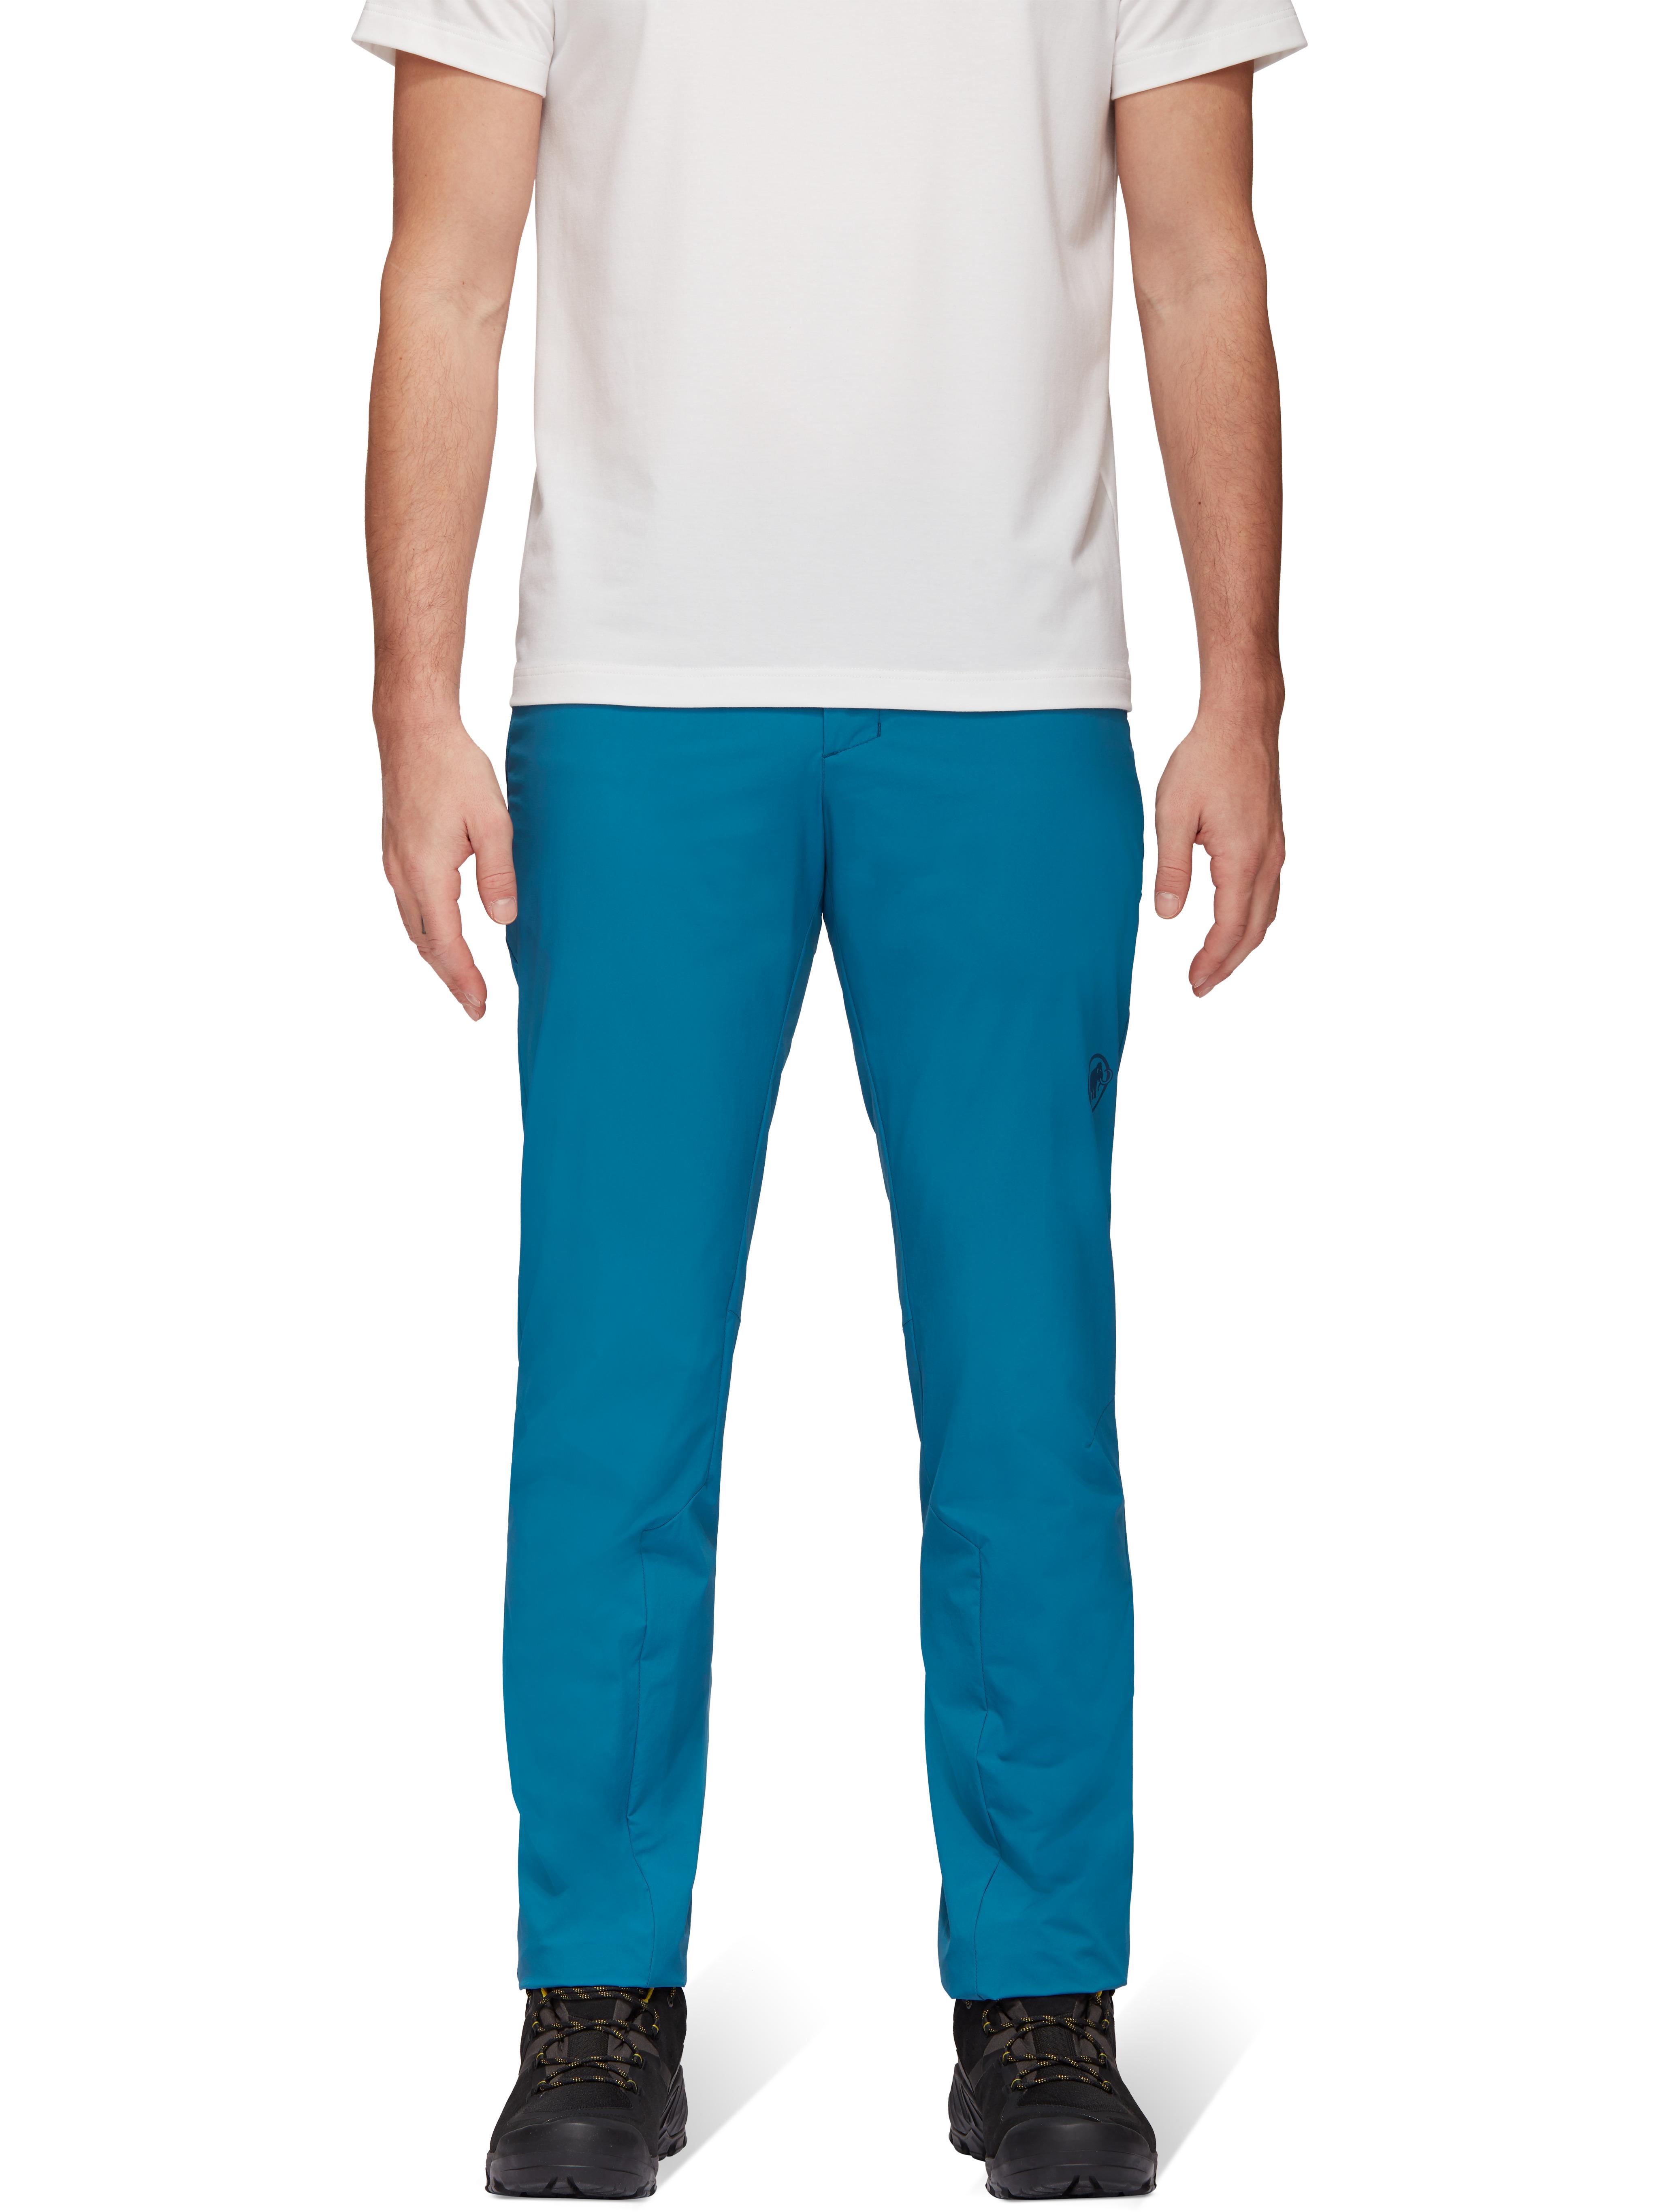 Runbold Light Pants Men product image